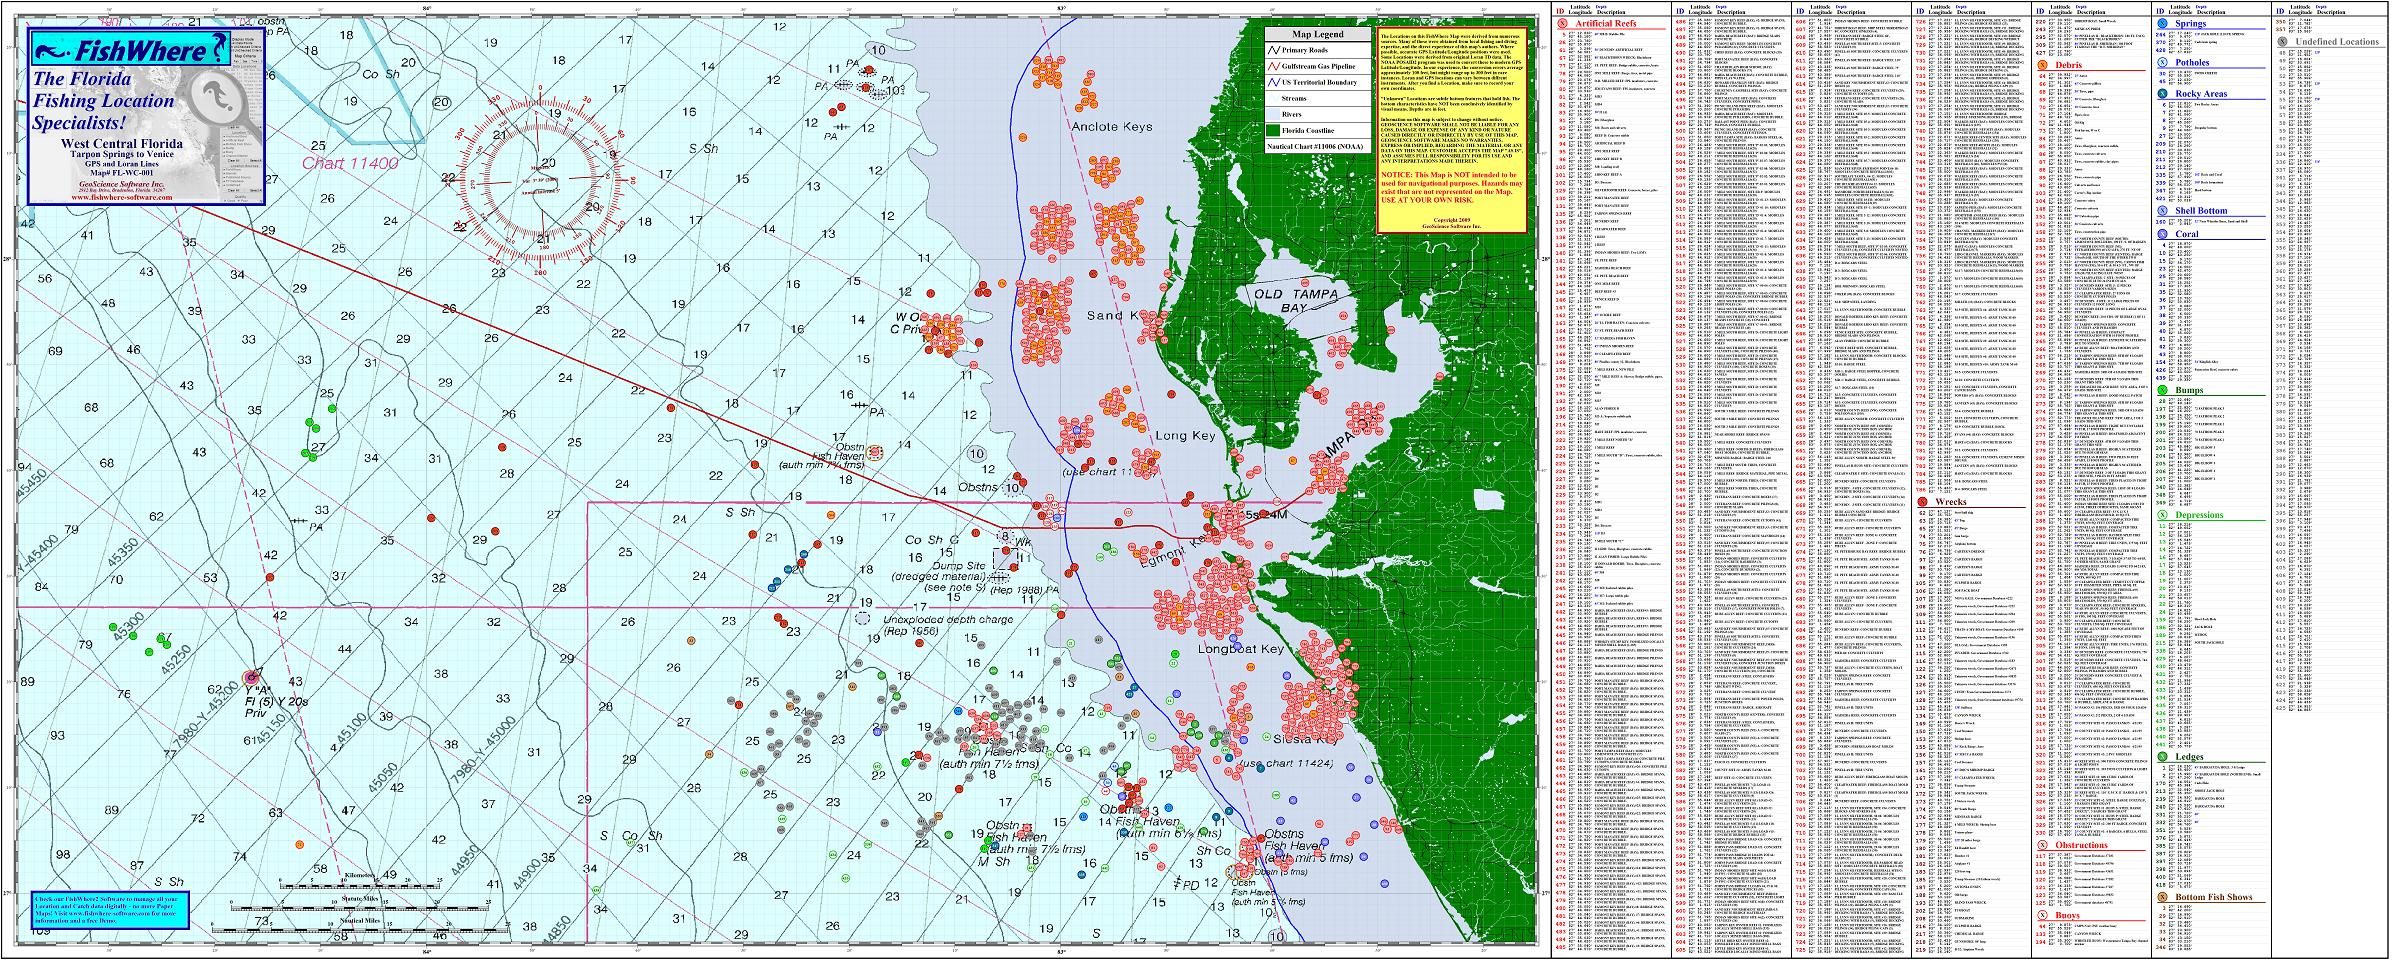 Florida Artificial Reefs Map.Fishing Charts Florida Fishwhere